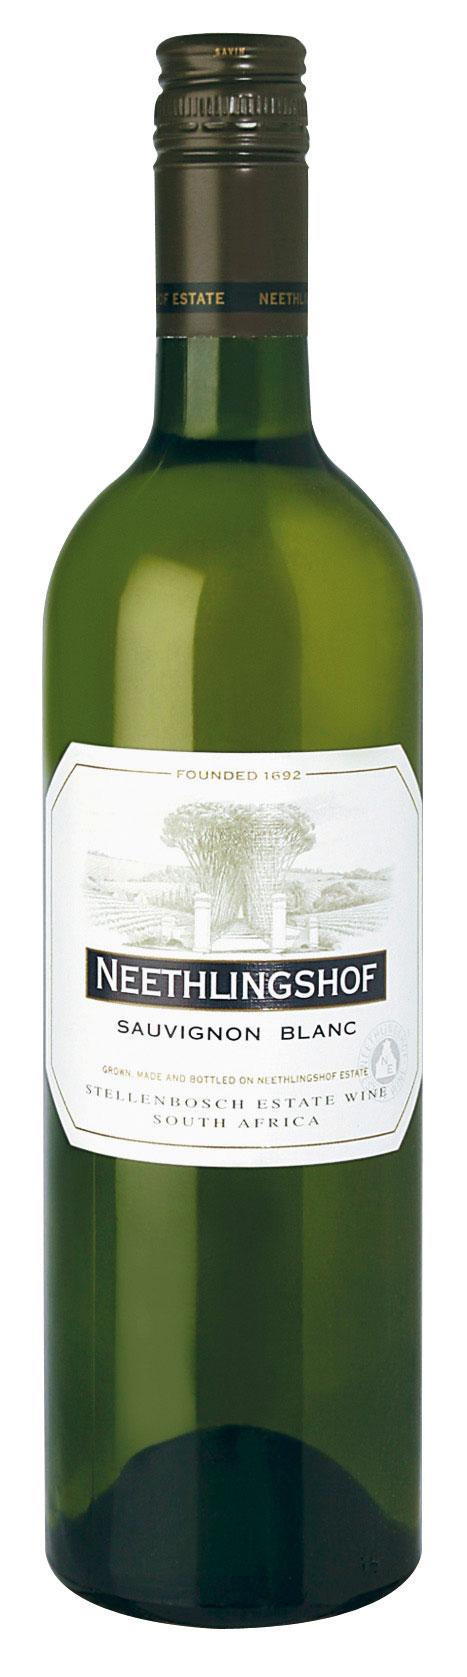 Neethlingshof Sauvignon Blanc 2019